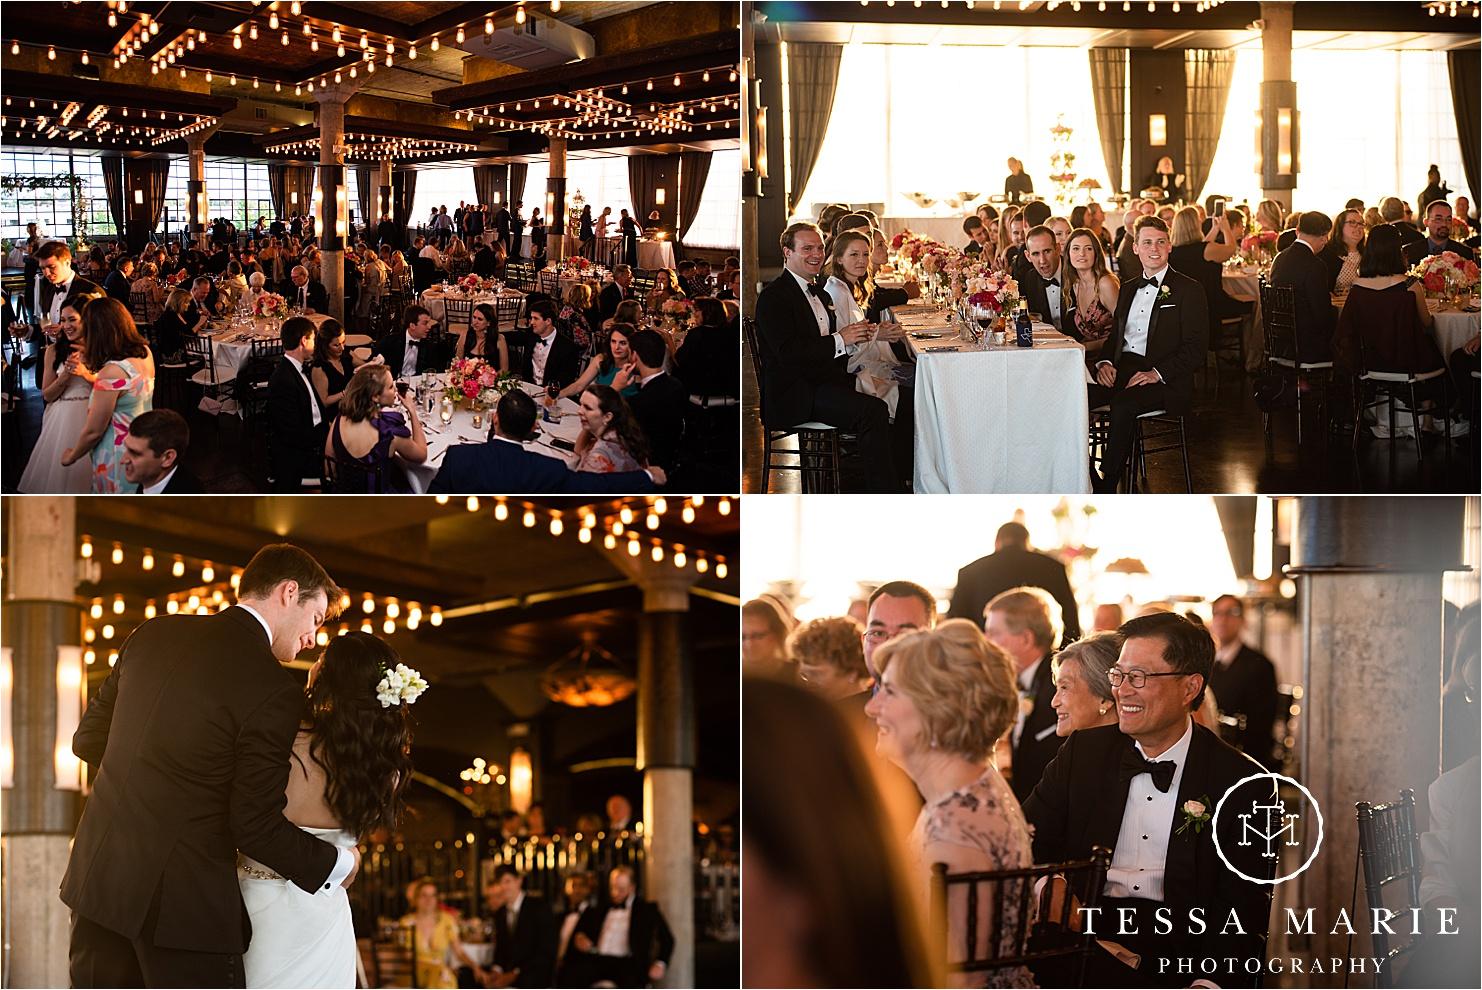 Tessa_marie_weddings_houston_wedding_photographer_The_astorian_0152.jpg